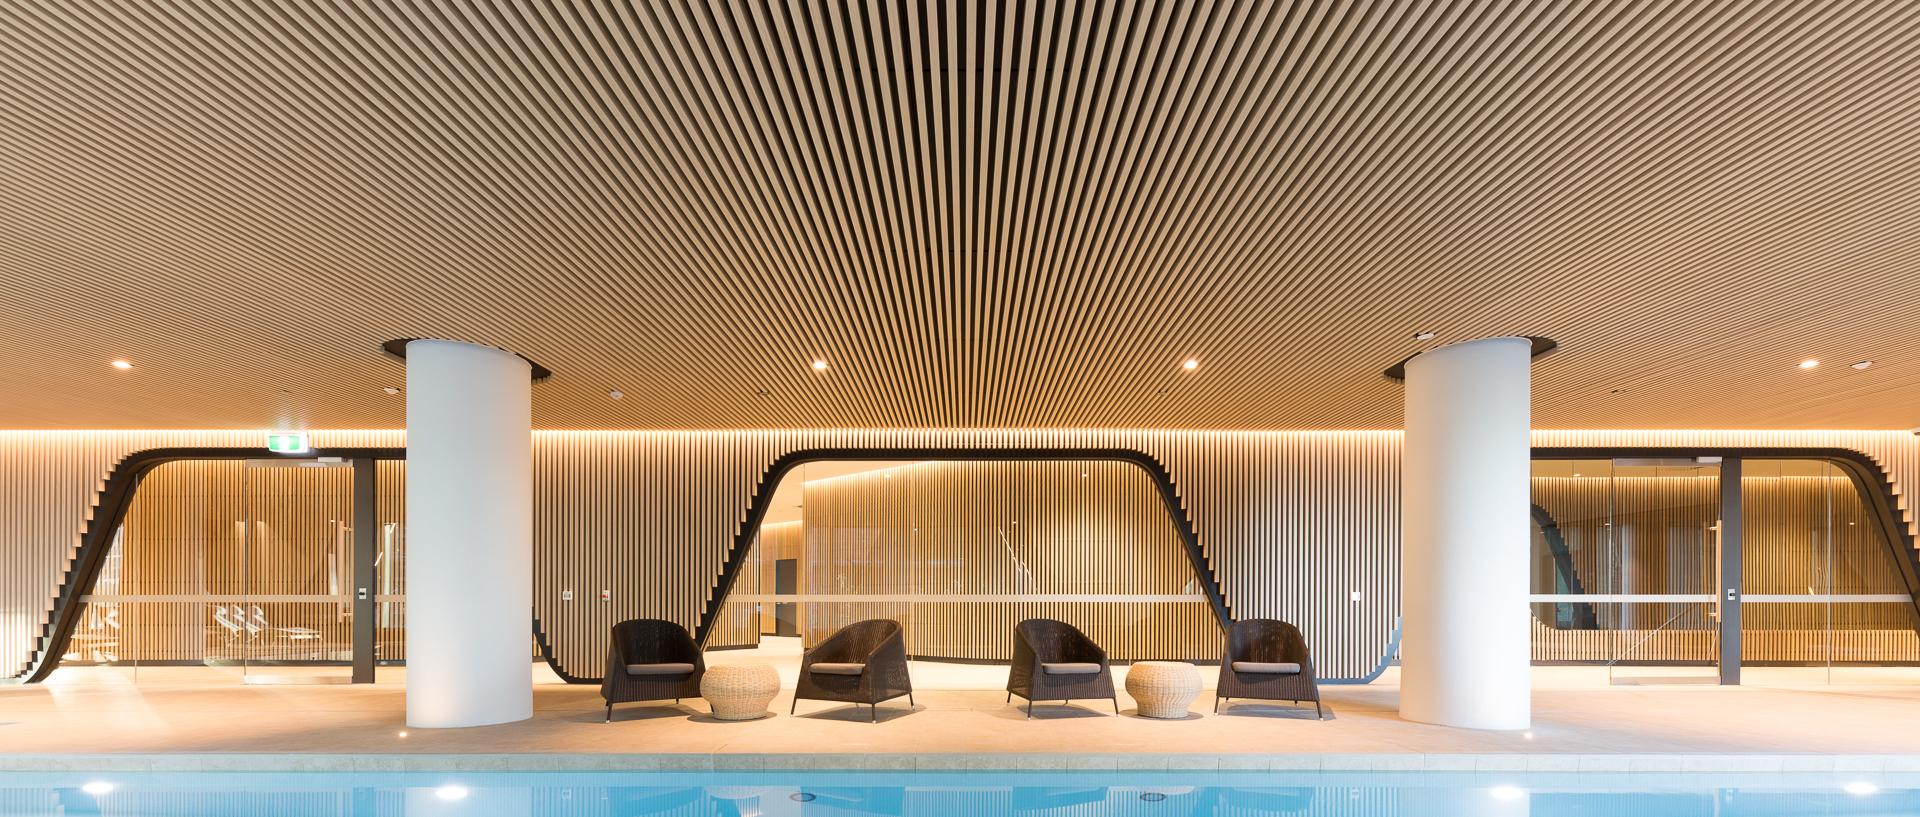 Covet Art Wood timber look aluminium wall and ceiling cladding.JPG